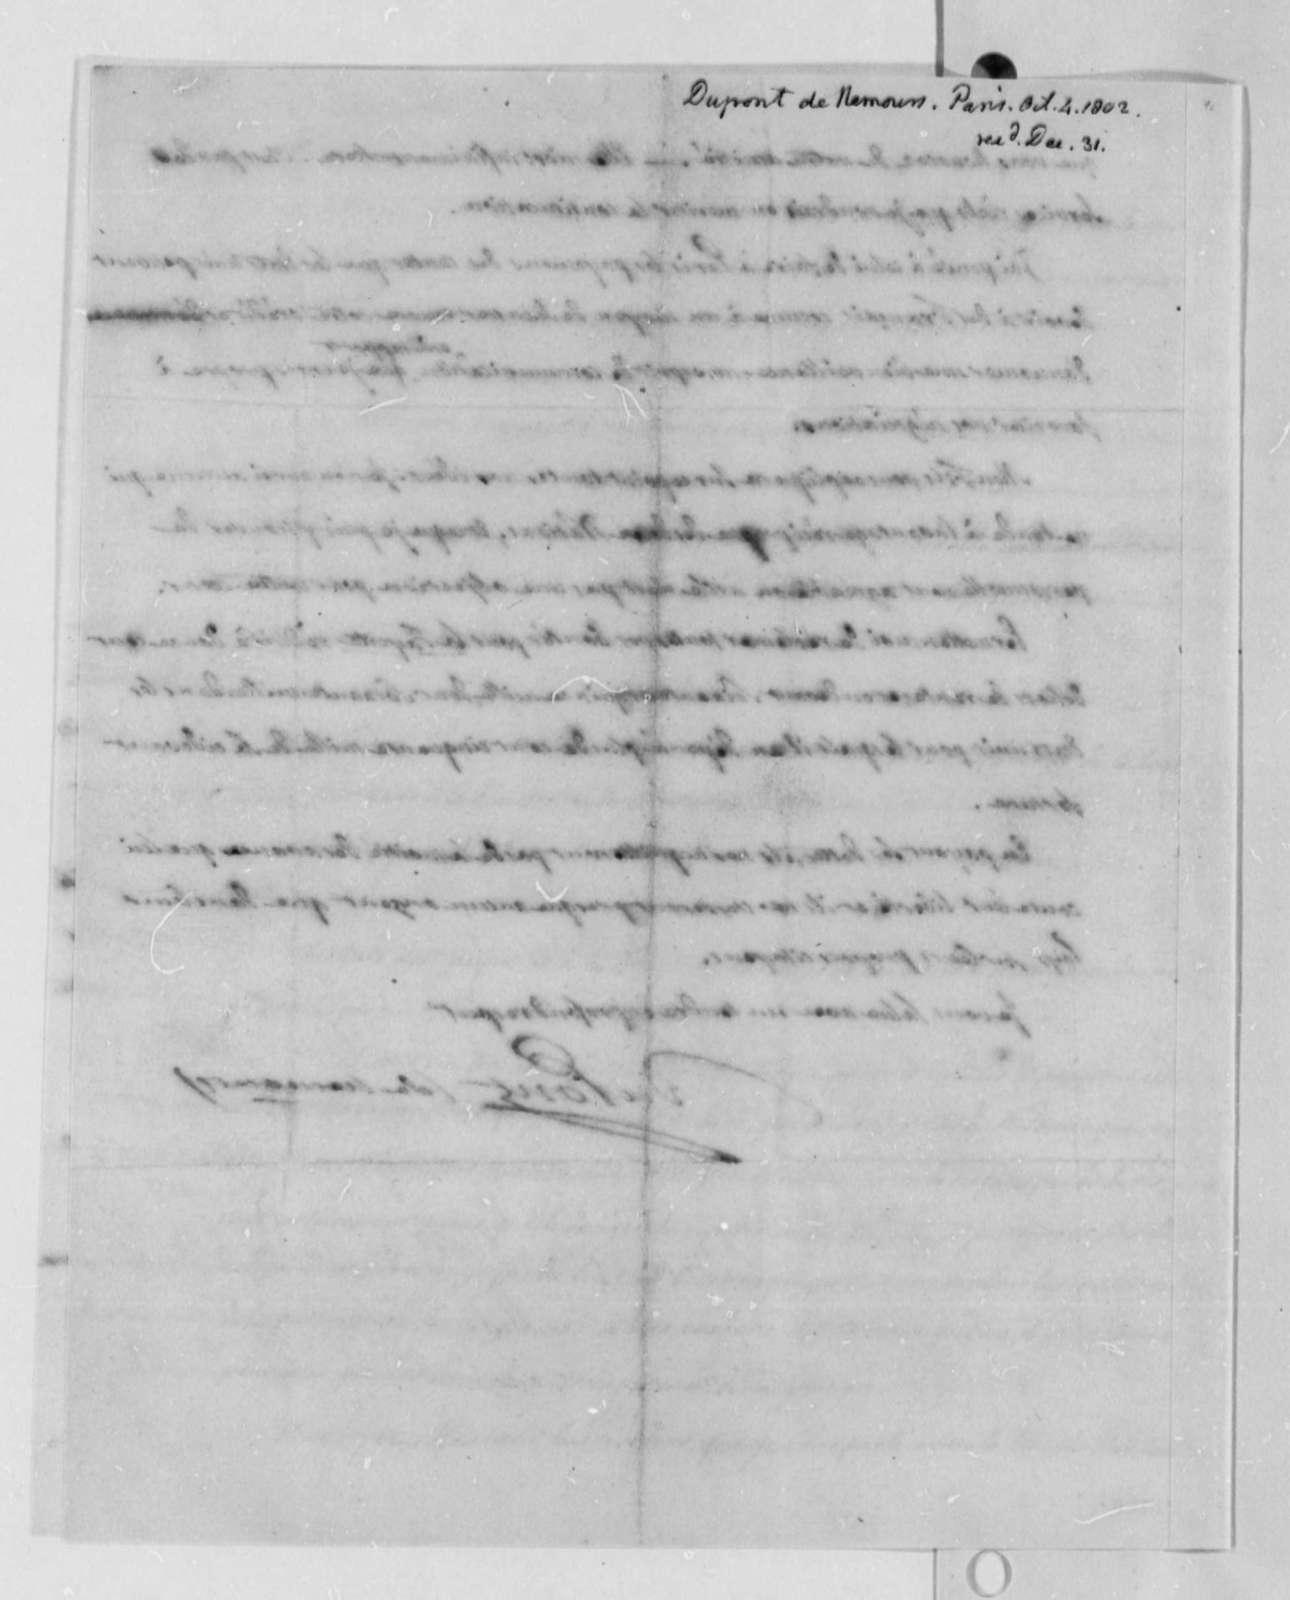 Pierre Samuel Dupont de Nemours to Thomas Jefferson, October 4, 1802, in French